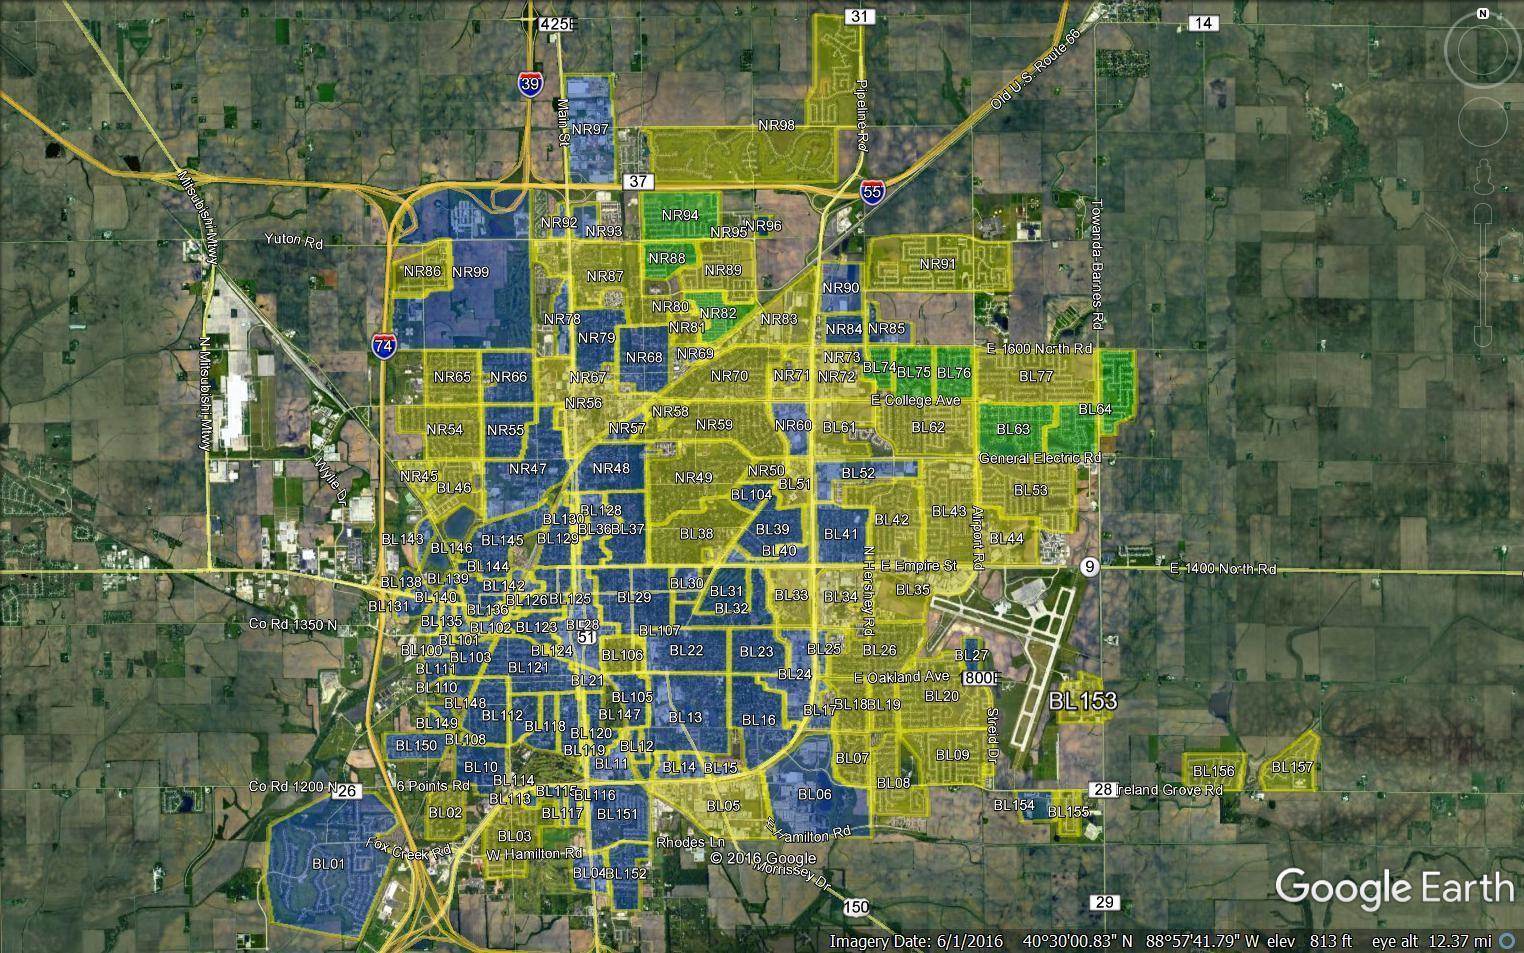 Year Later Metronet Grows Footprint In Bloomington Normal